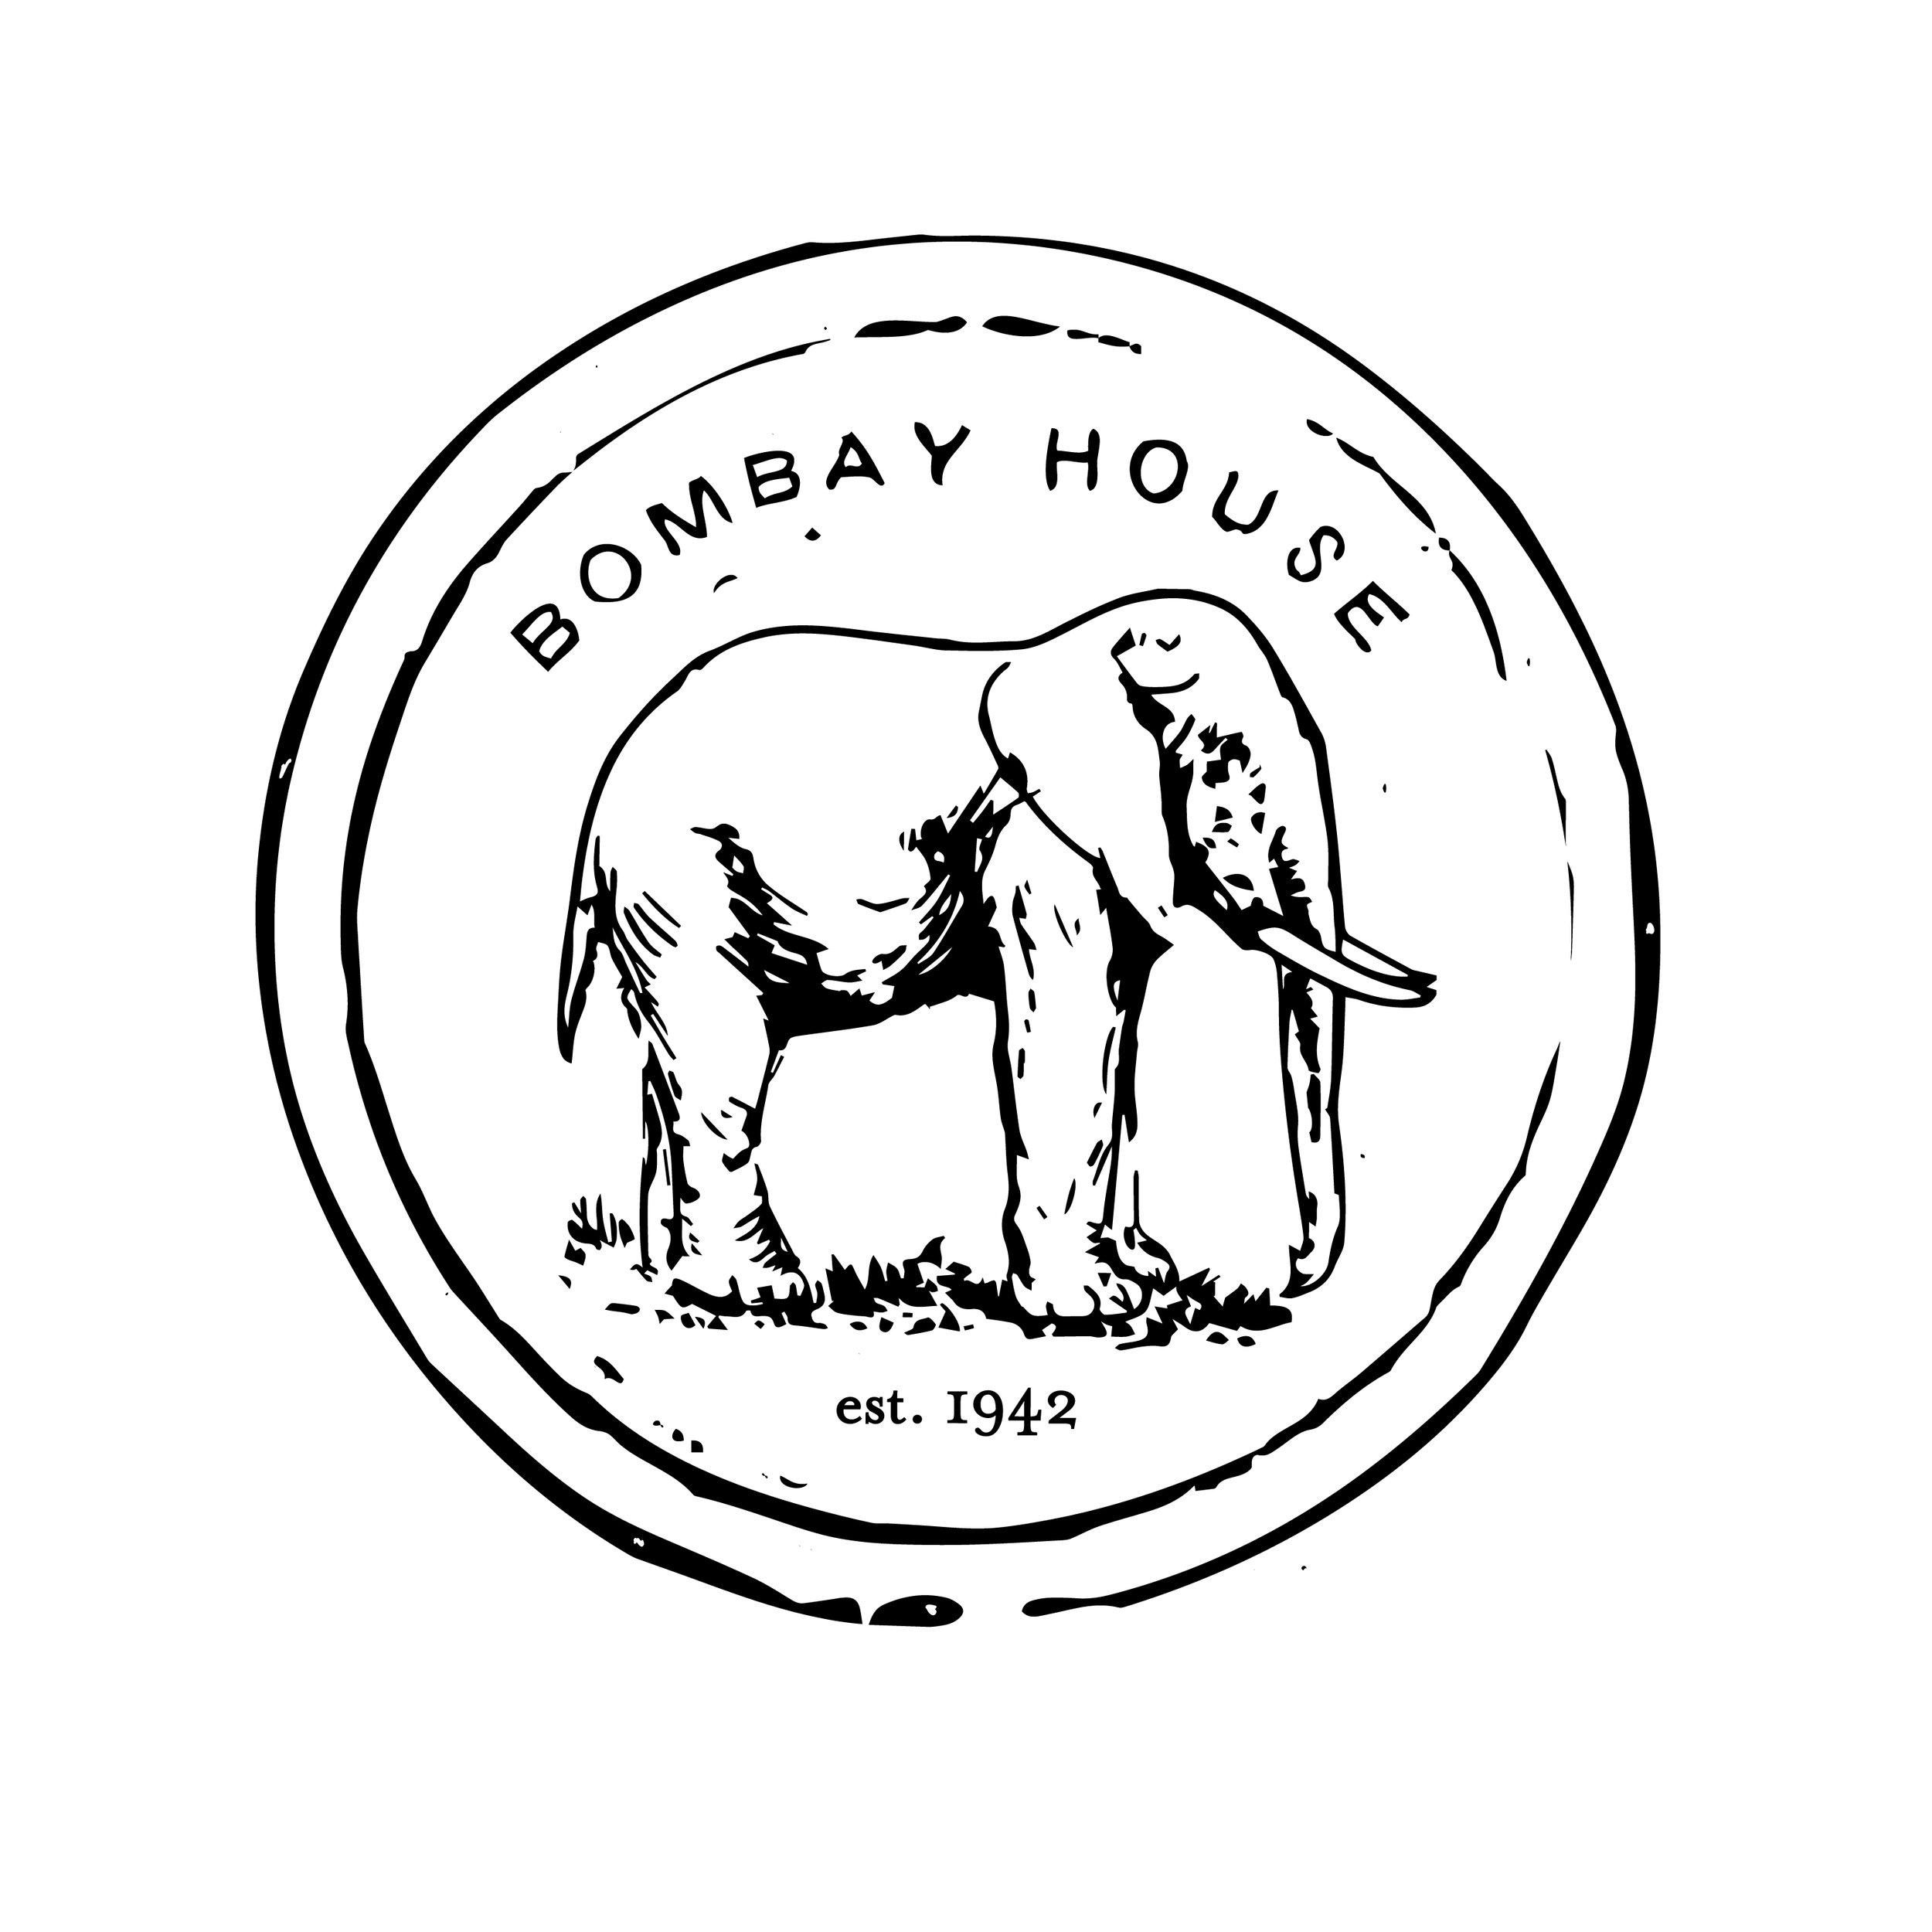 bombay-house.jpg